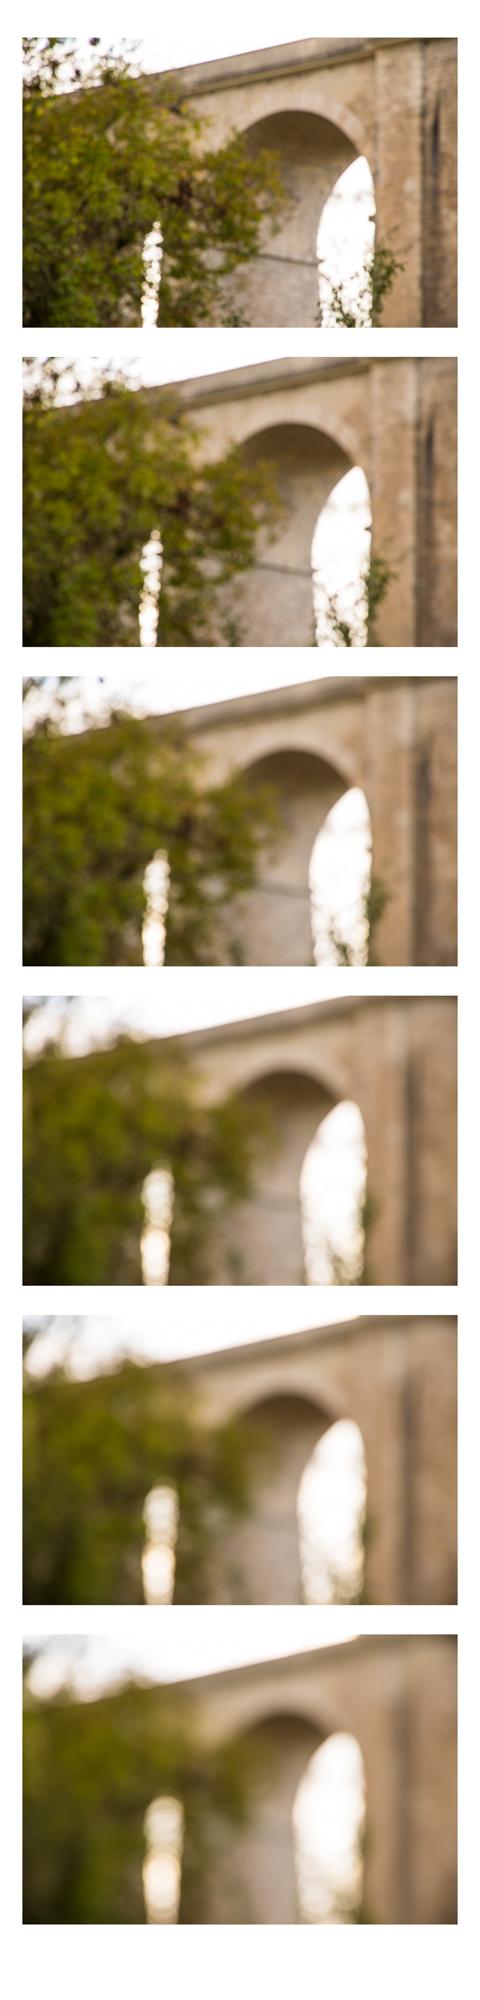 out focus 1.jpg